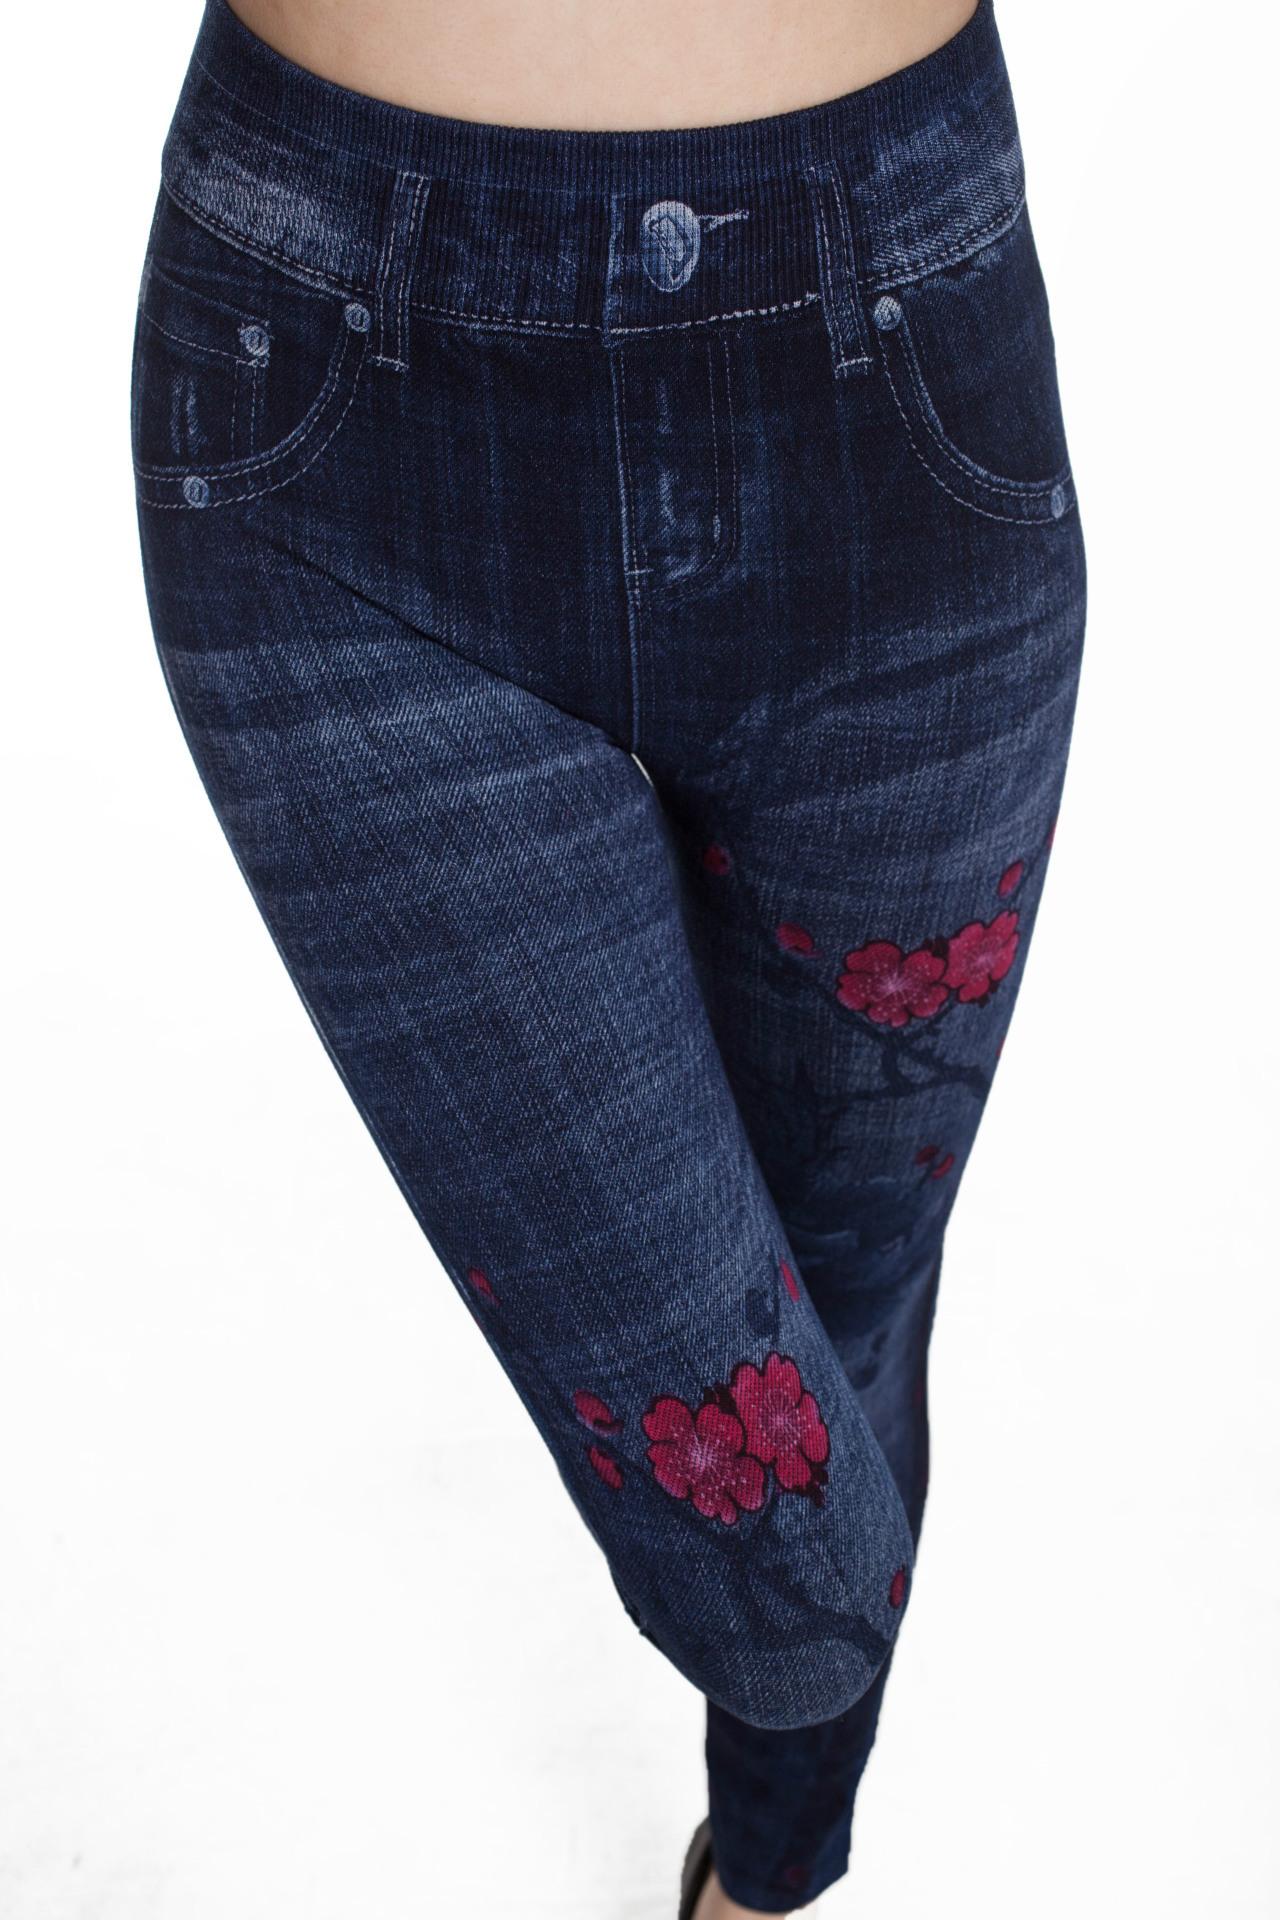 Denim Jeans For Women On Sale